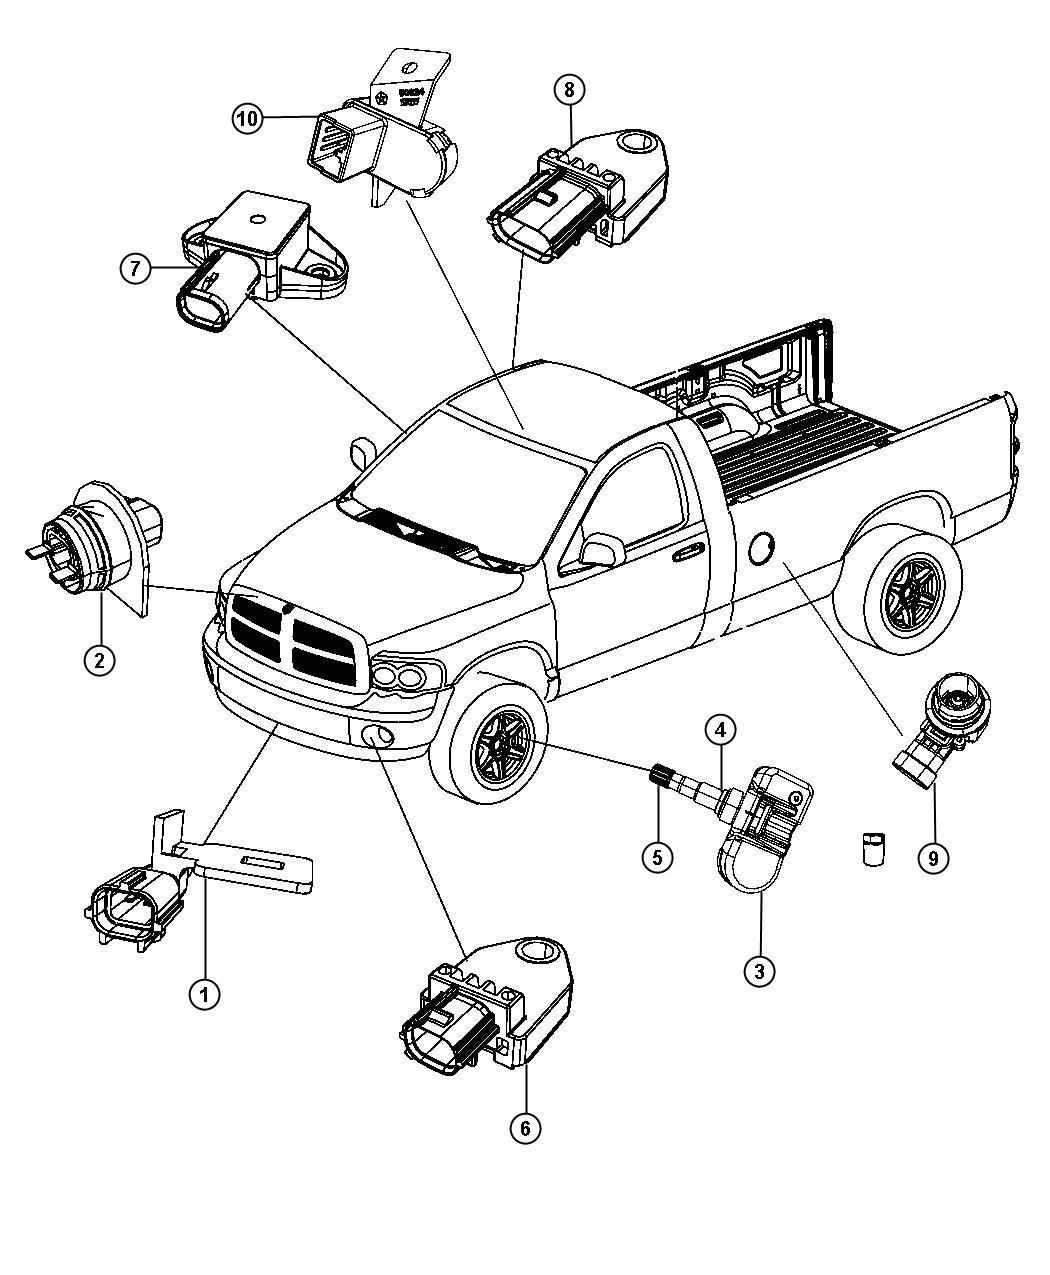 Jeep Liberty Sensor Infrared Trim O0 Rear Power System